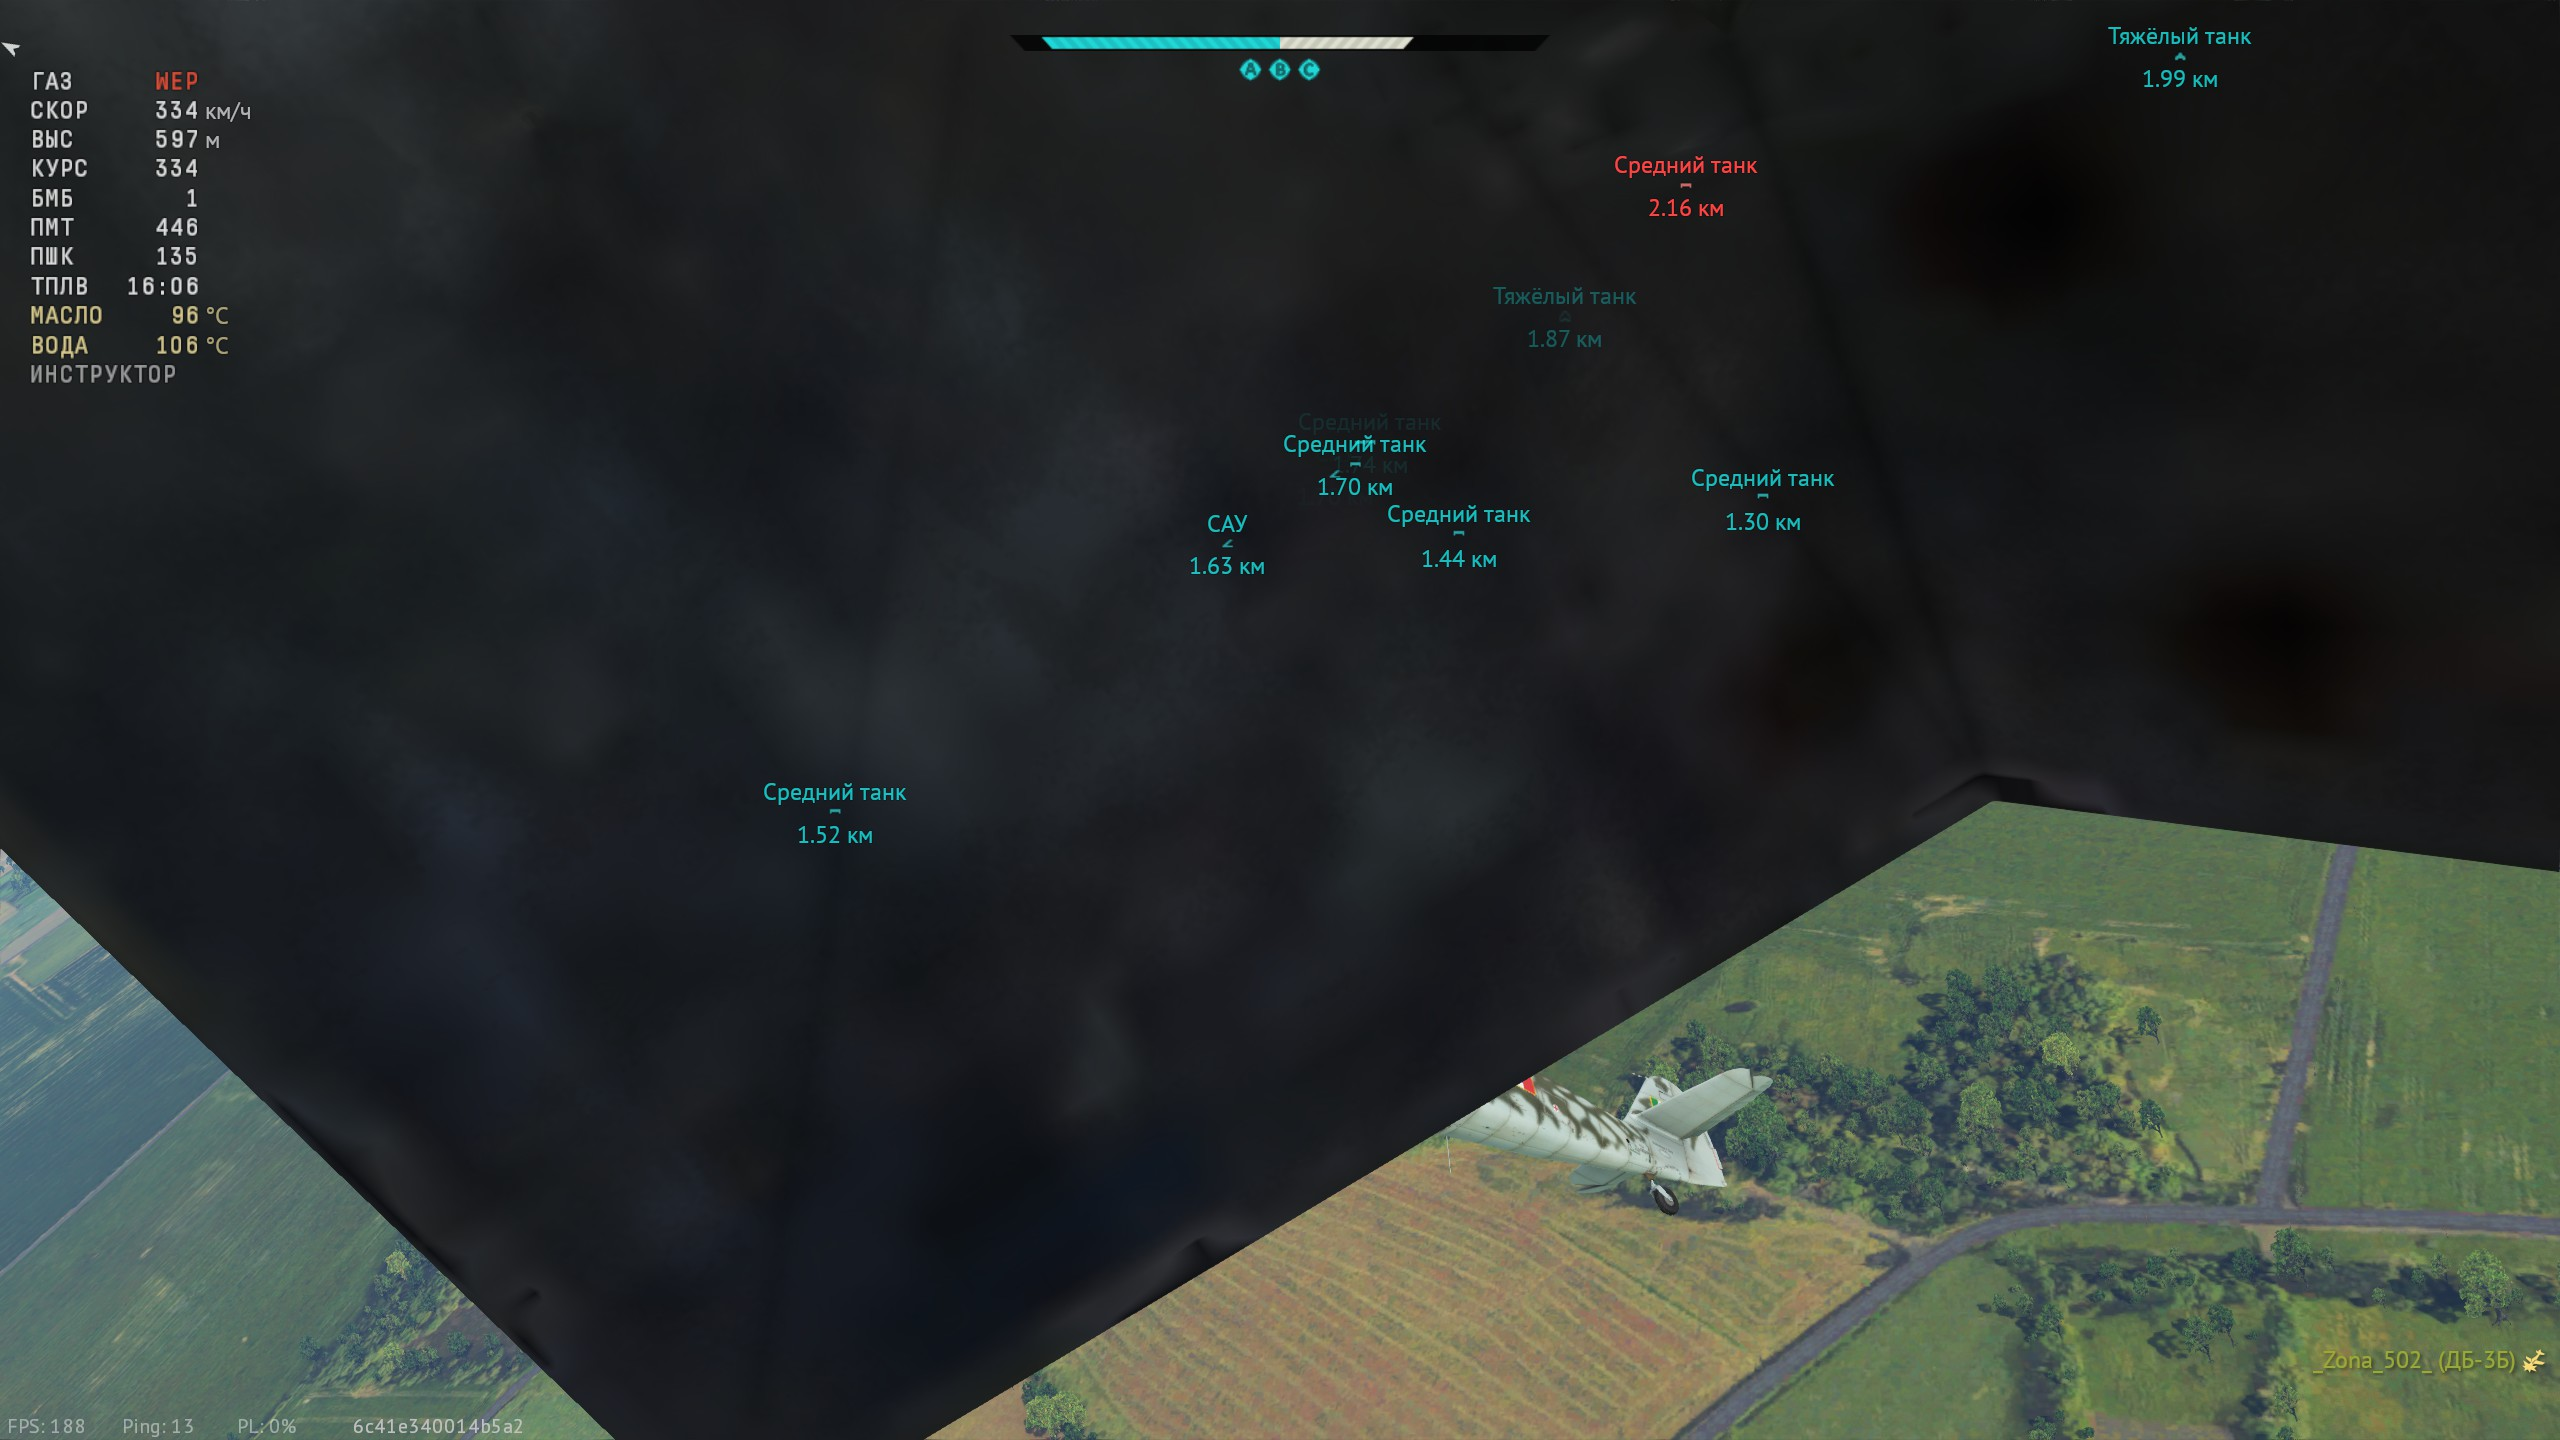 петрович вар тандер